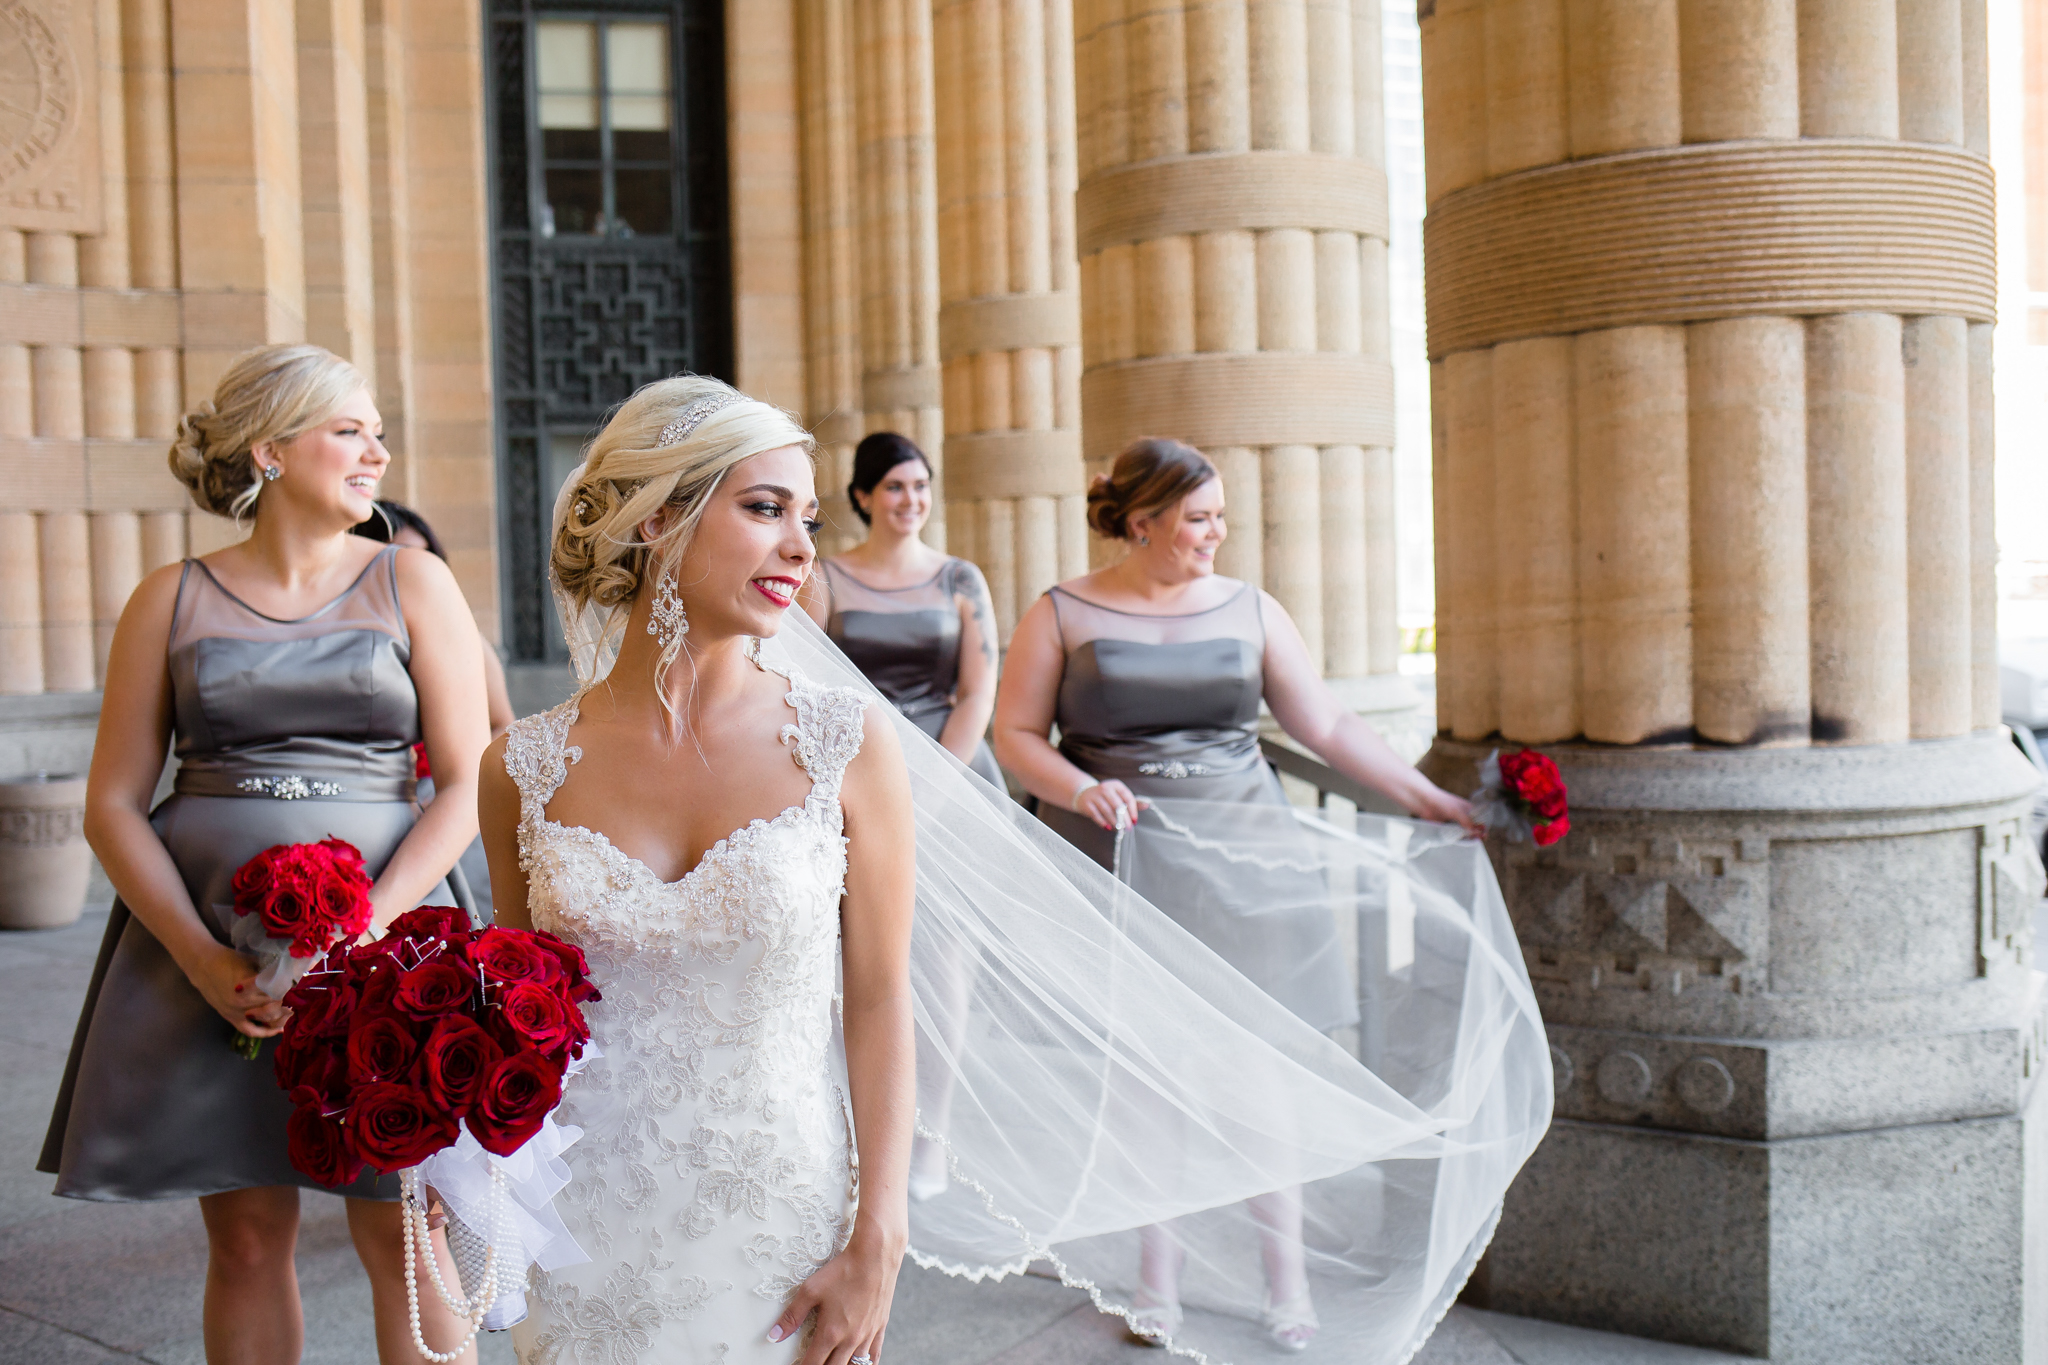 Statler-City-Buffalo-wedding-photographer- 0430.jpg